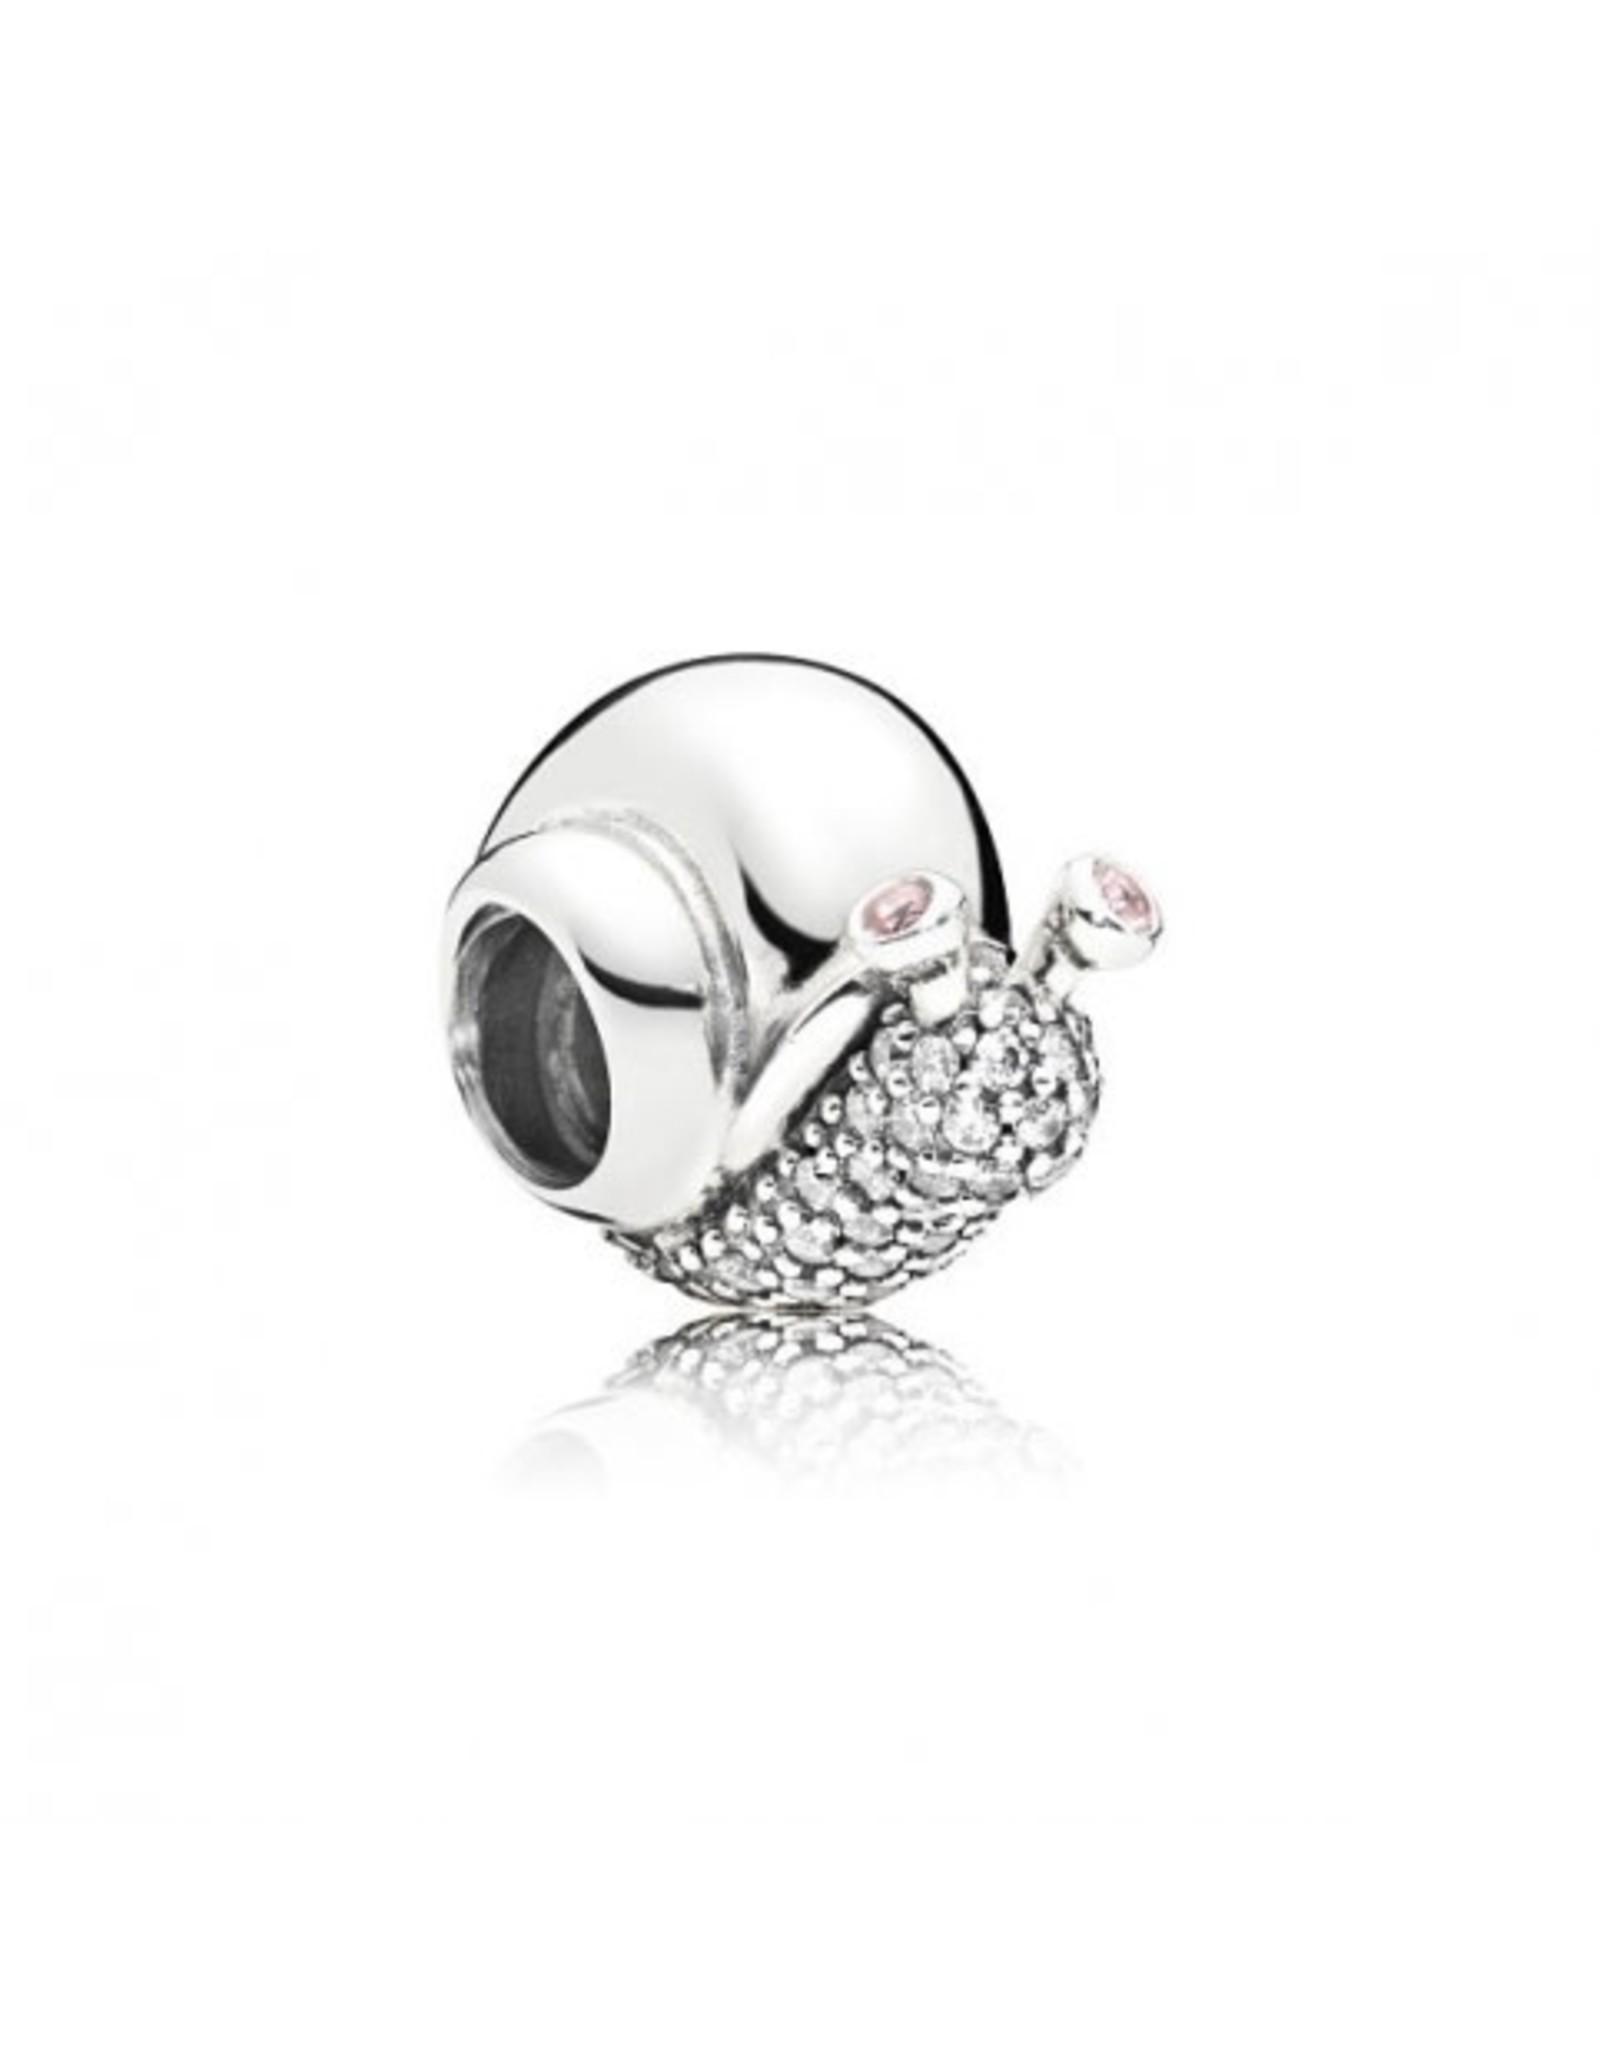 Pandora Pandora Charm, Sparkling Snail, Orchid Pink Crystals & Clear CZ